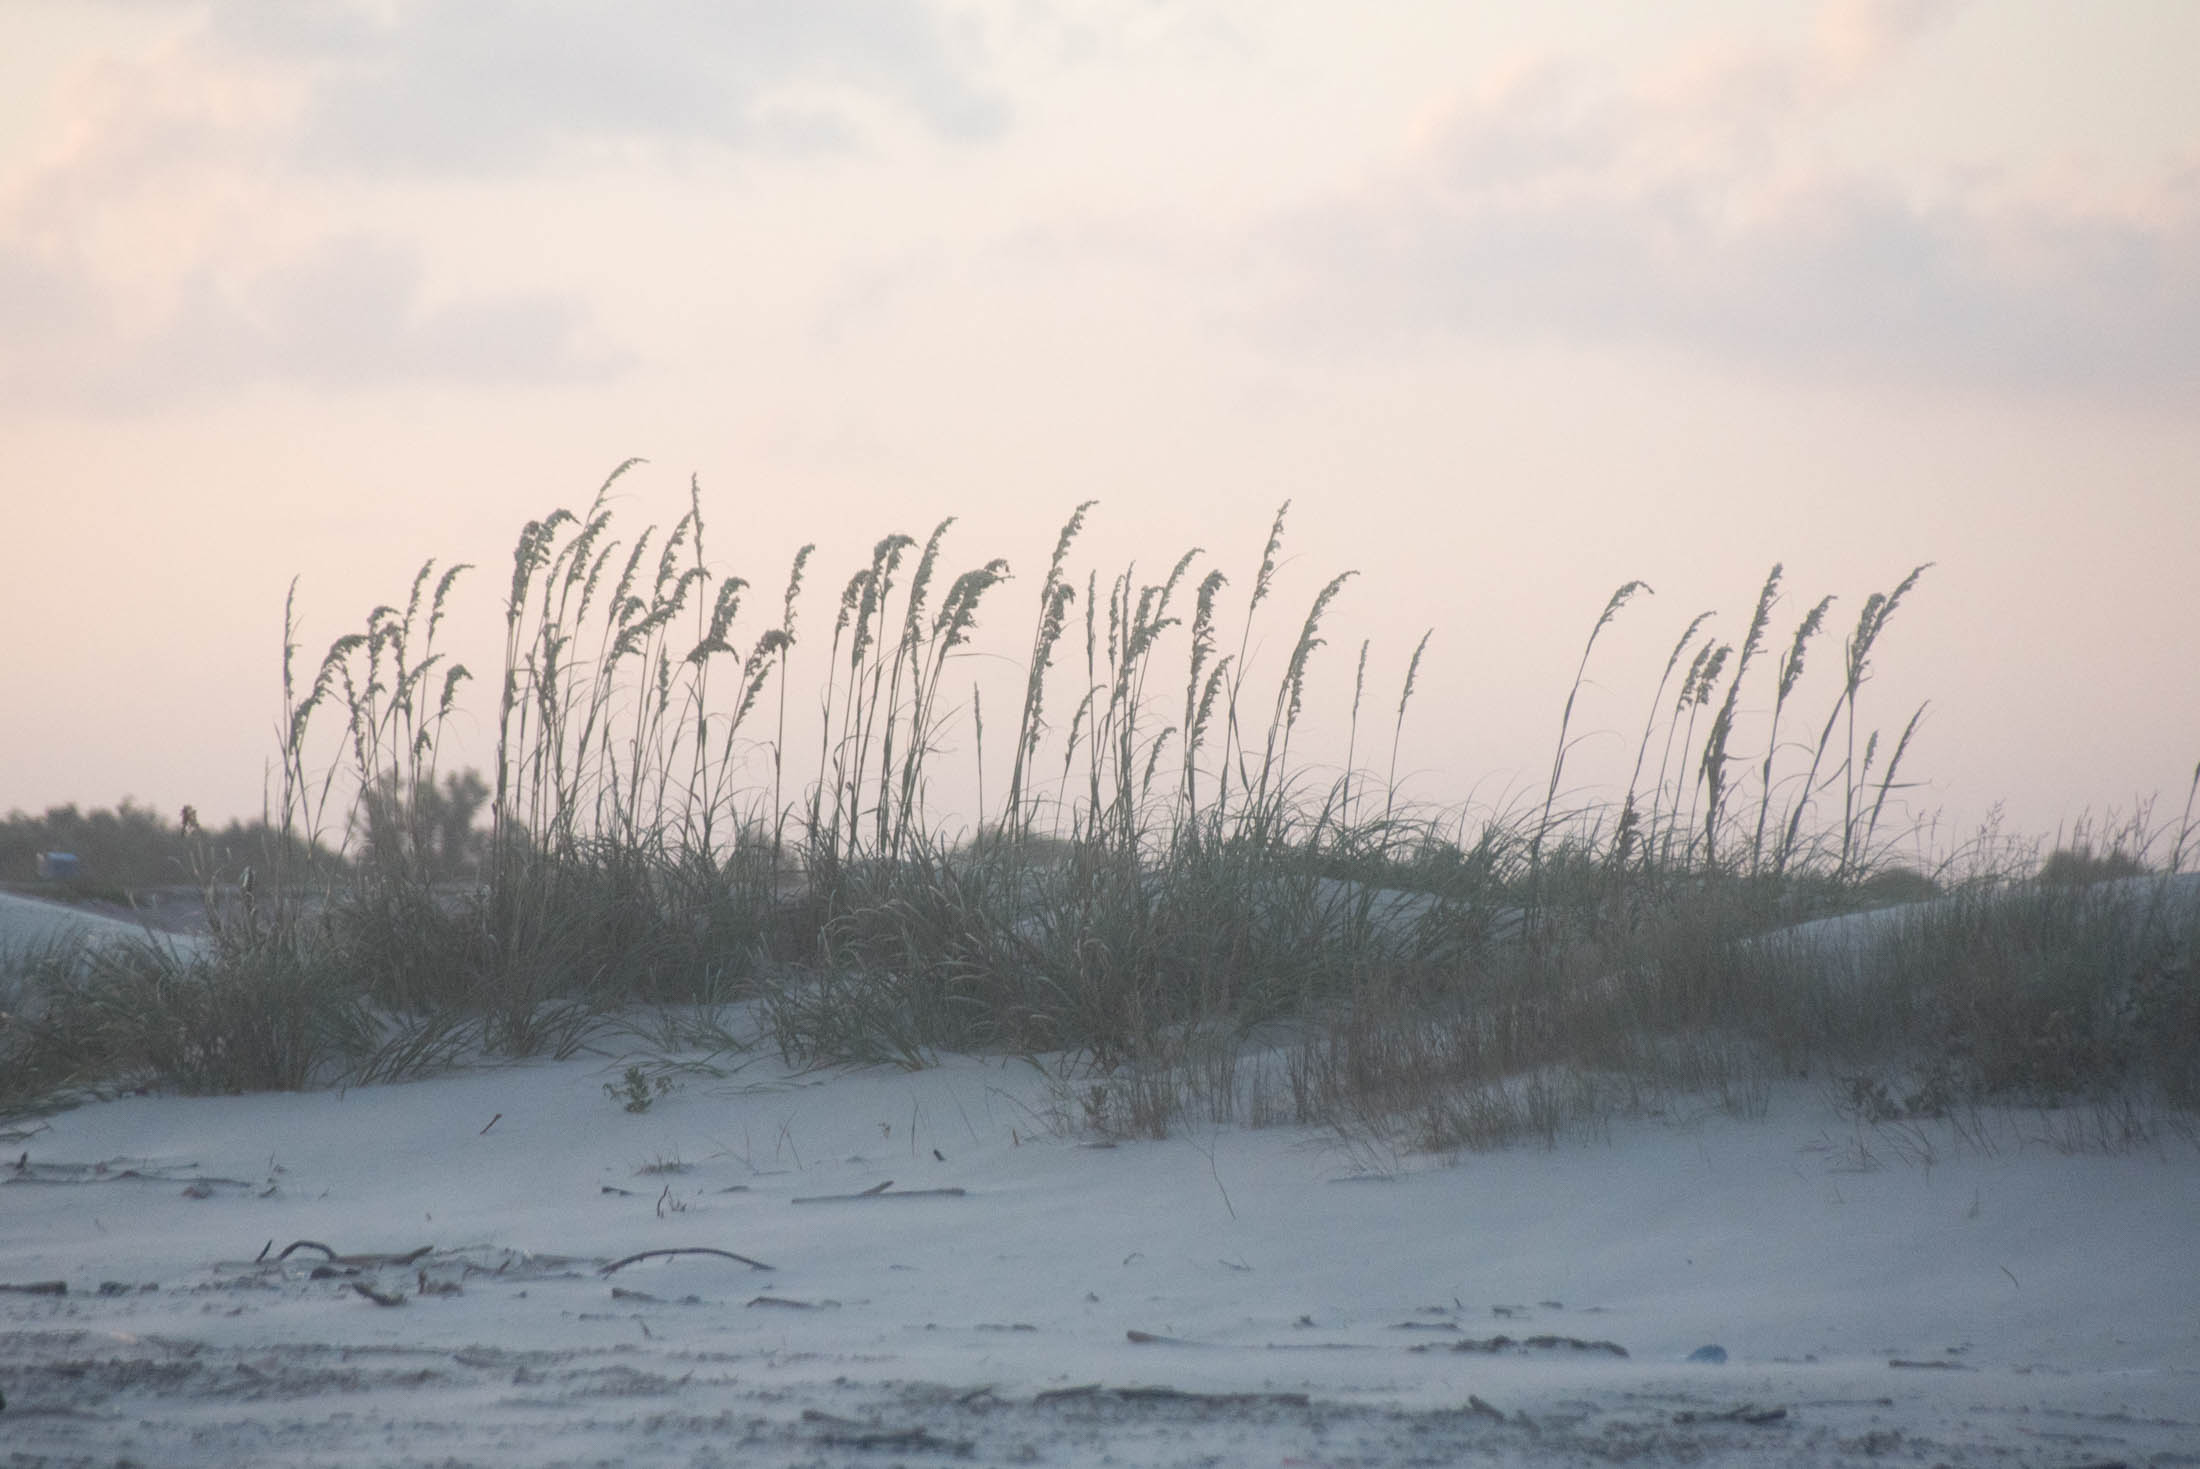 matagorda-beach-july-fourth-23